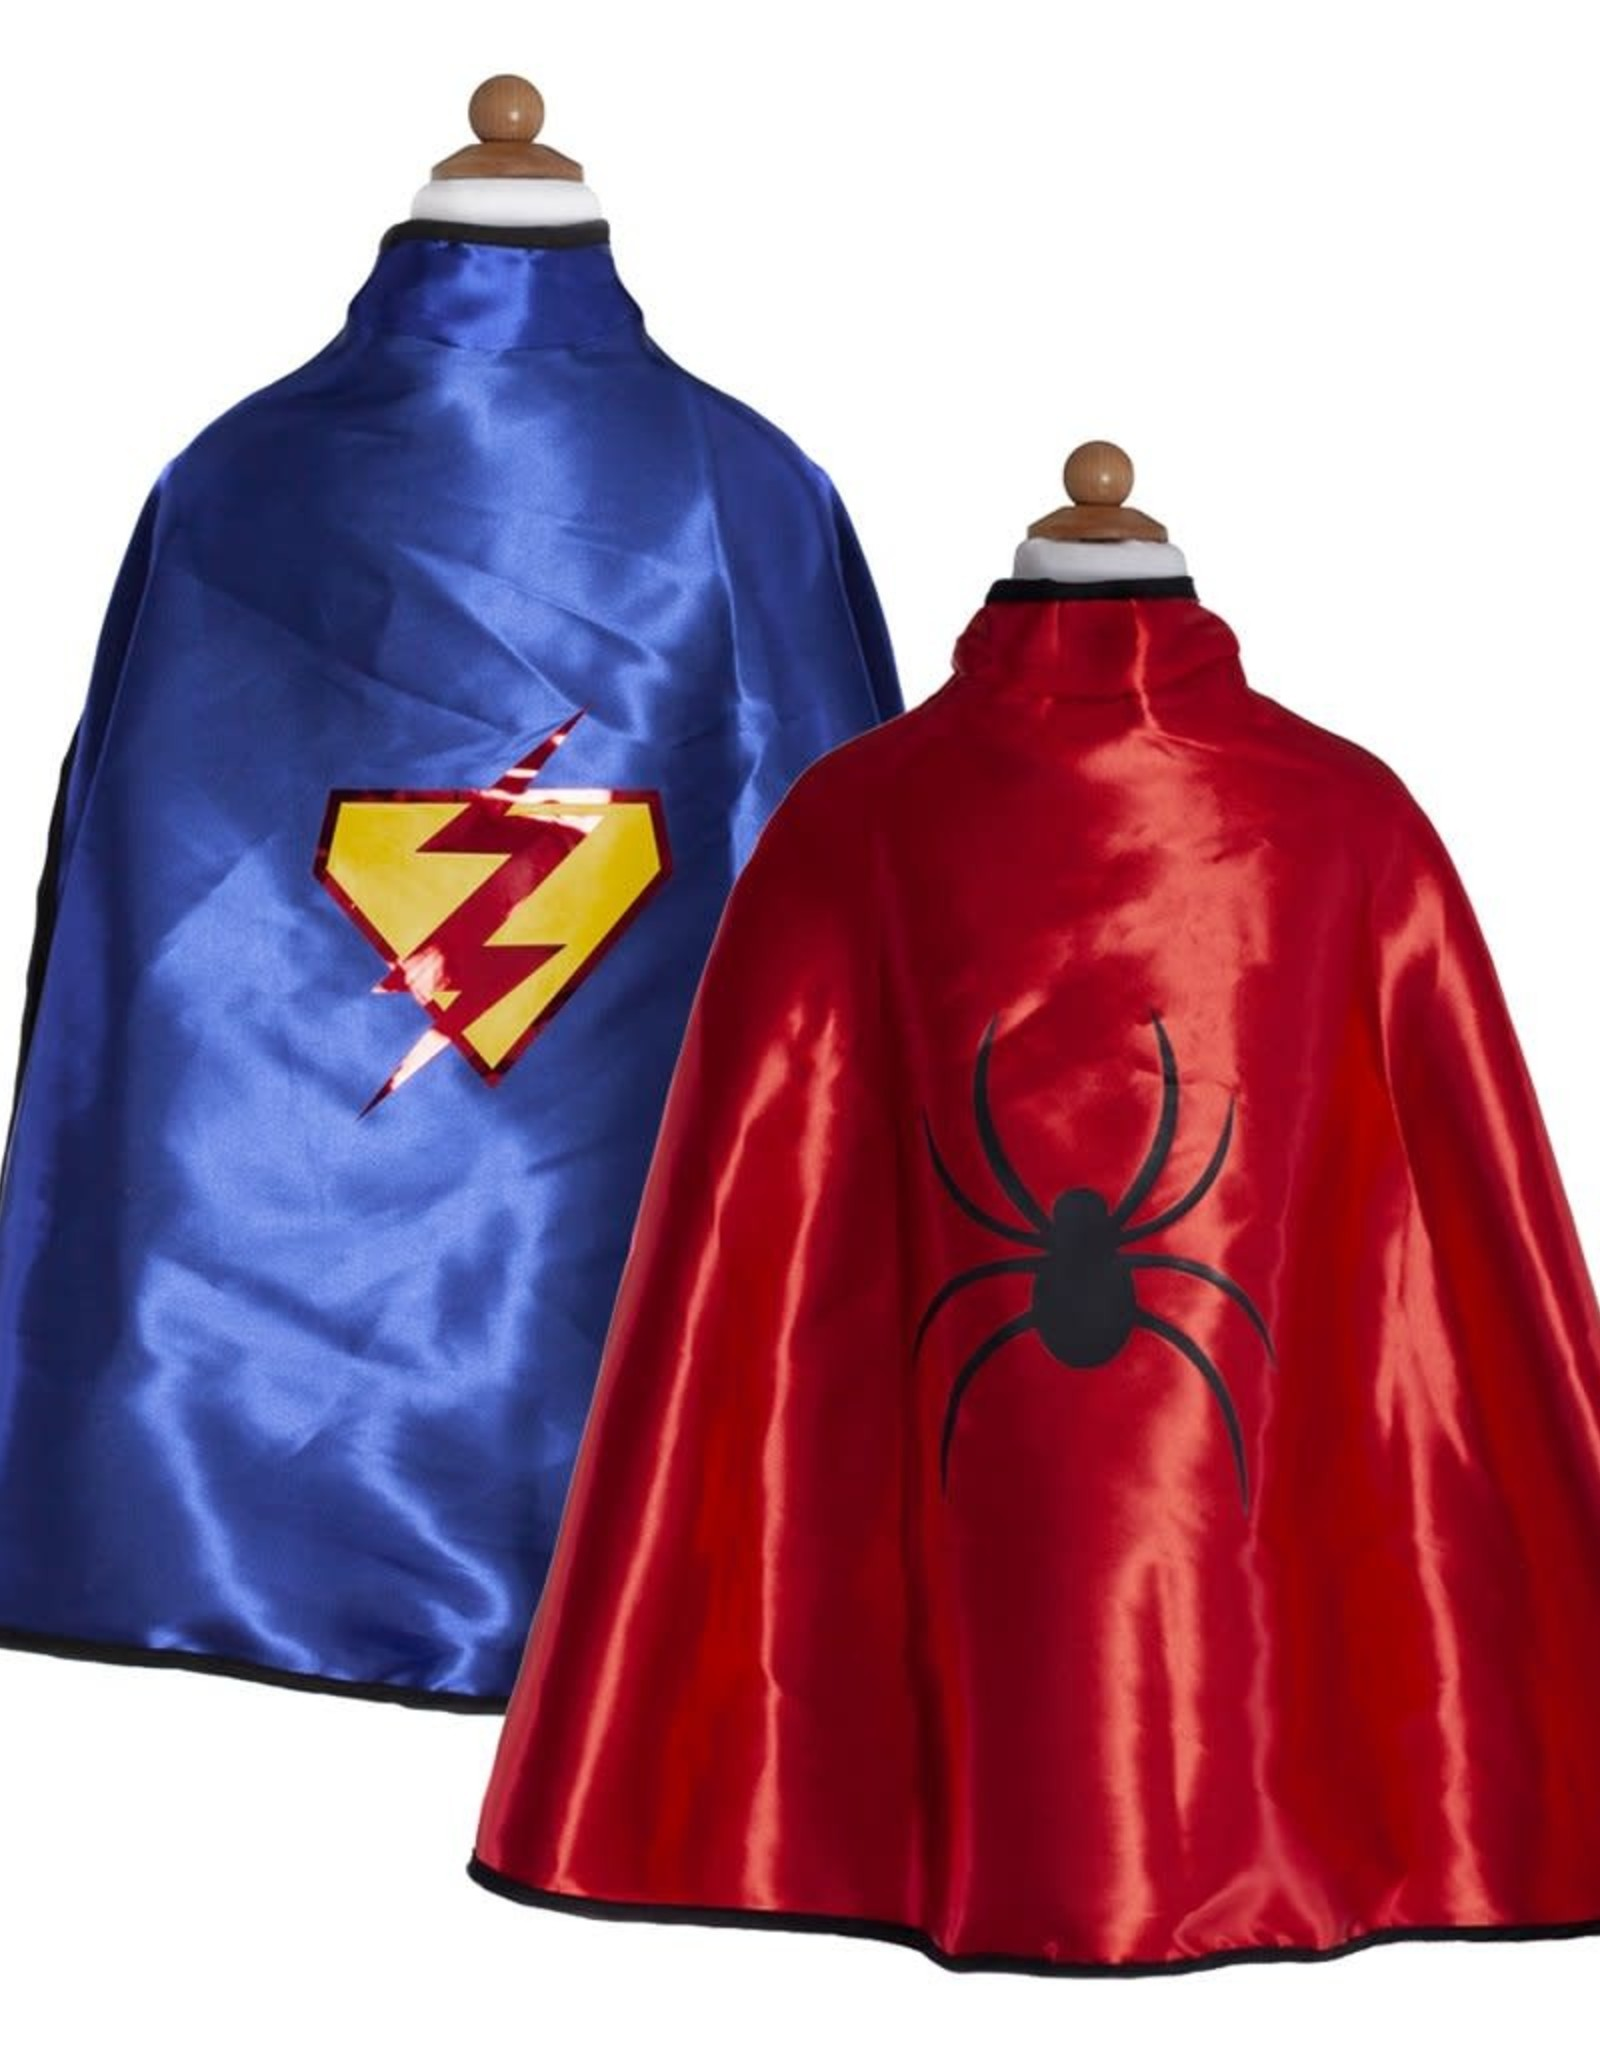 Great Pretenders Reversible Superhero/Bat Tunic With Cape & Mask, Size 4-7